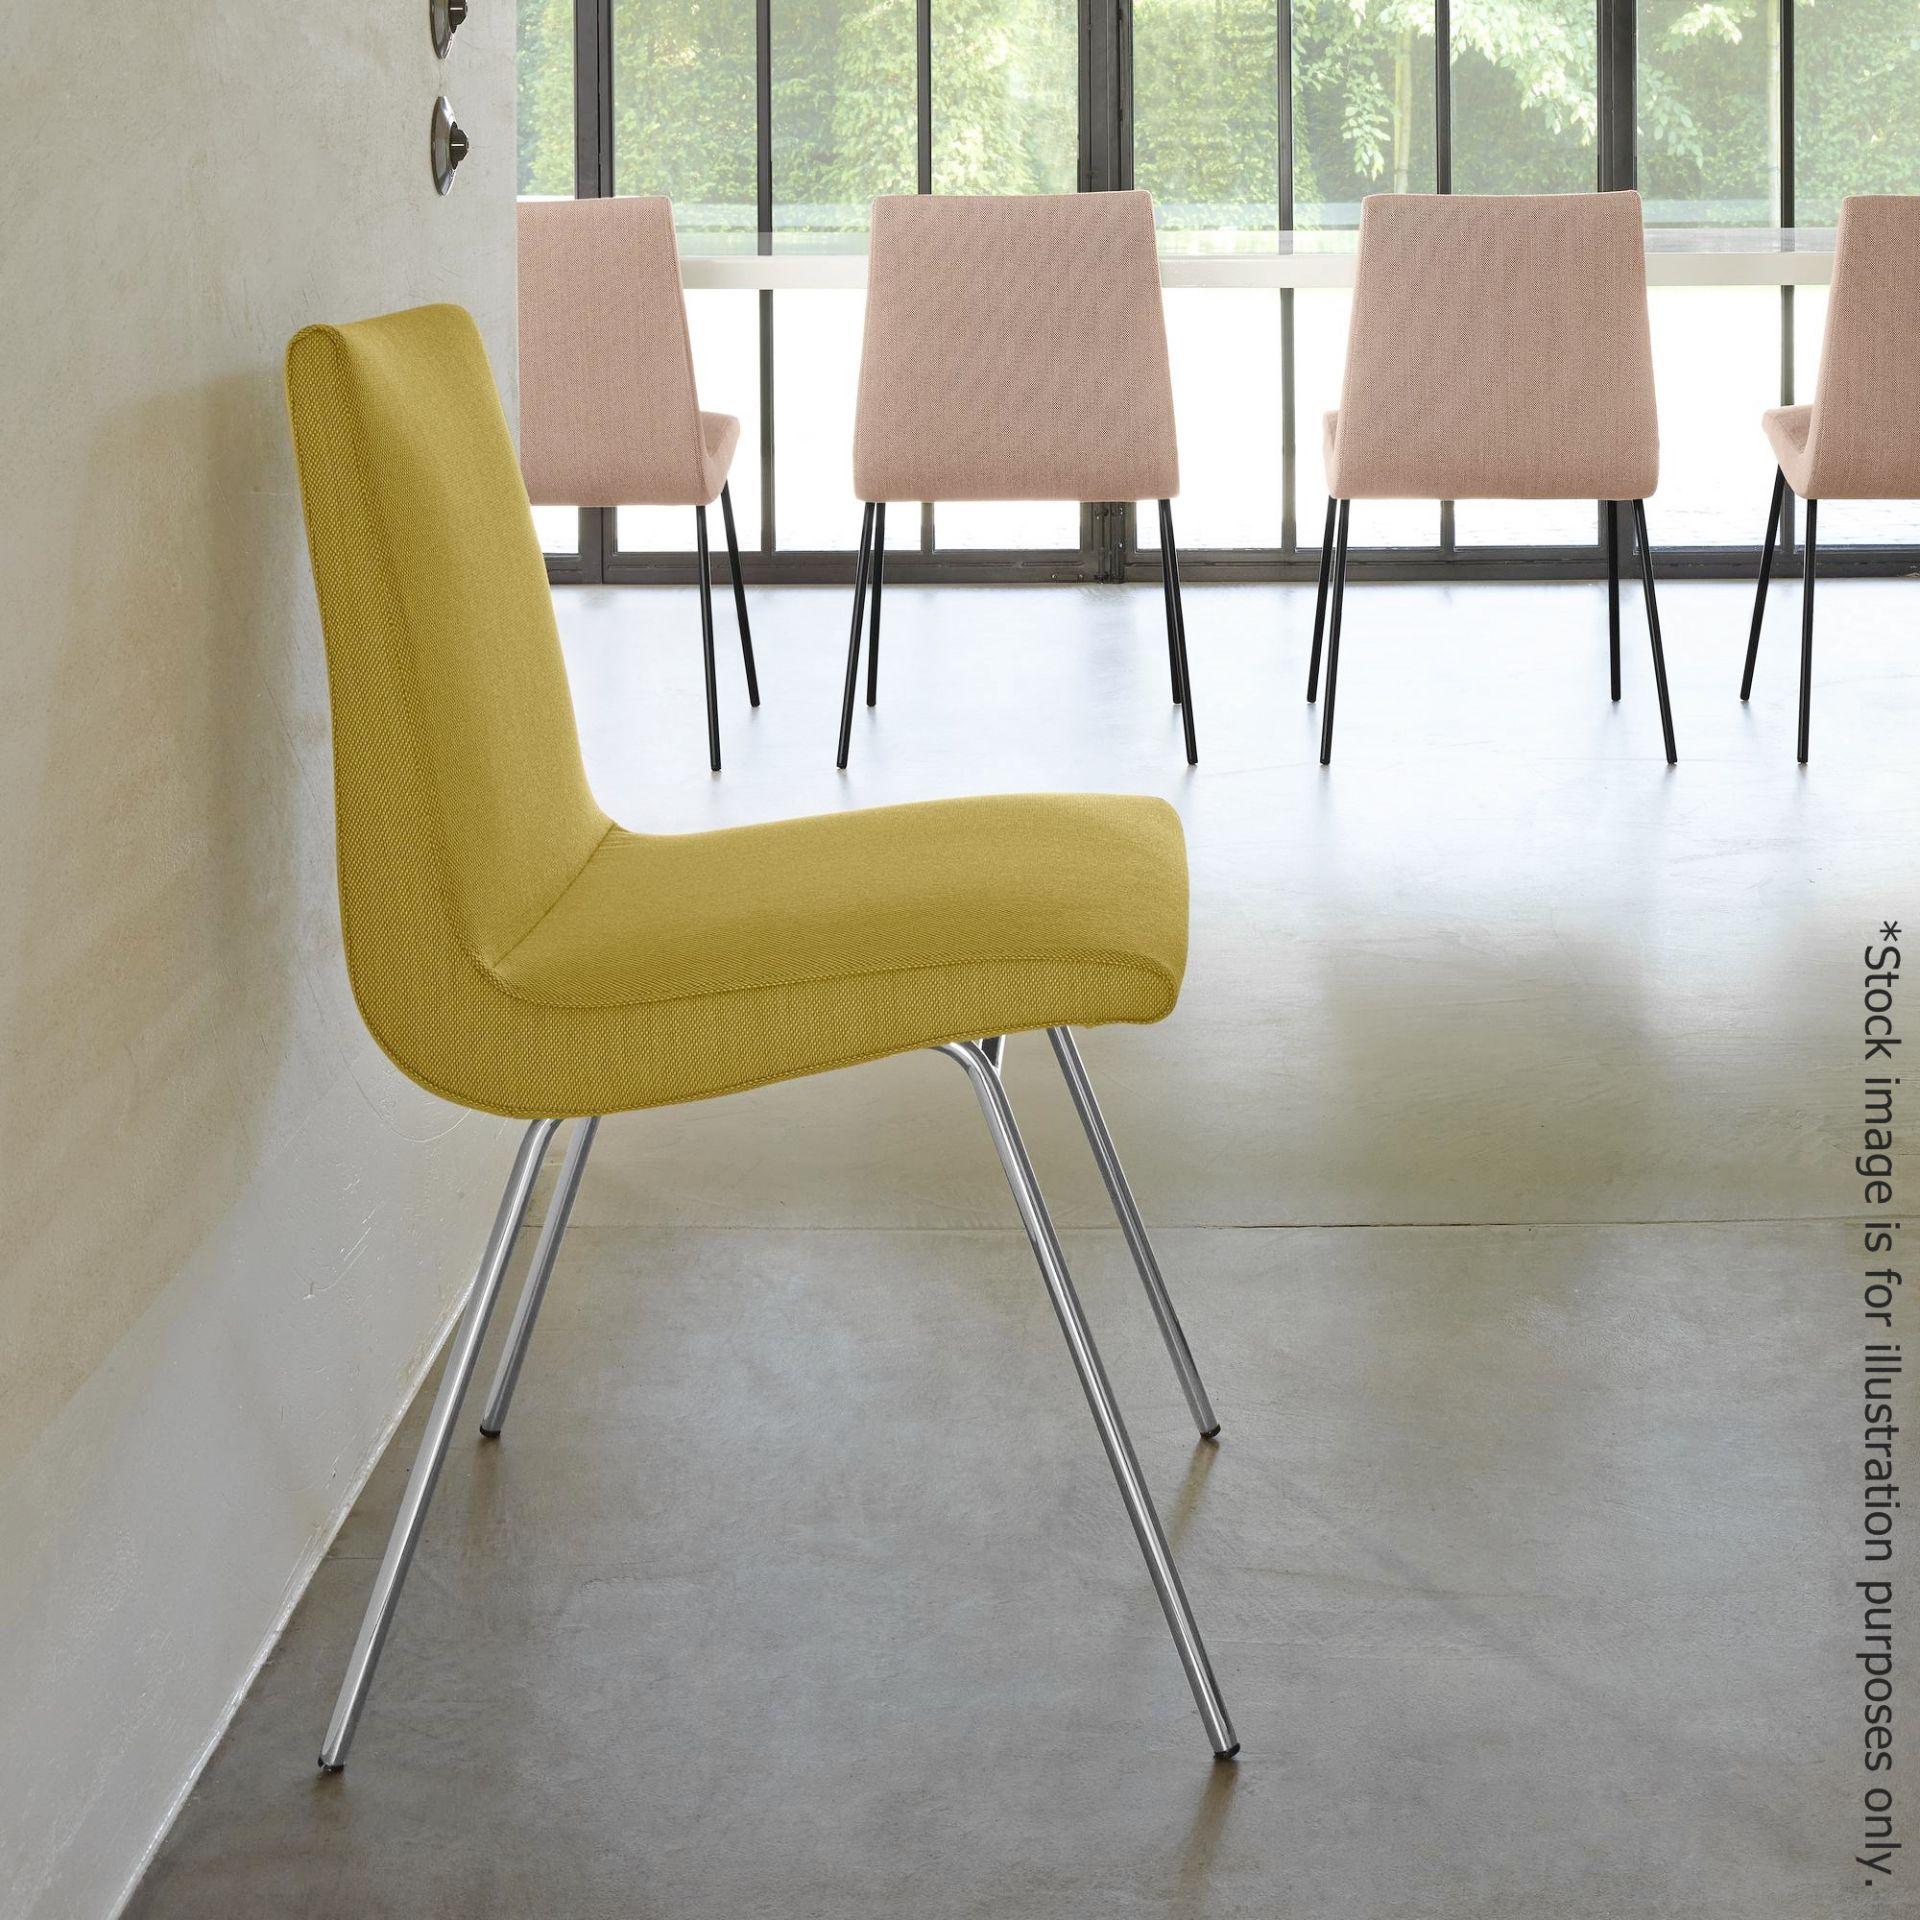 Pair Of LIGNE ROSET 'TV' Designer Dining Chairs In A Light Neutral Beige Fabric & Chromed Steel Legs